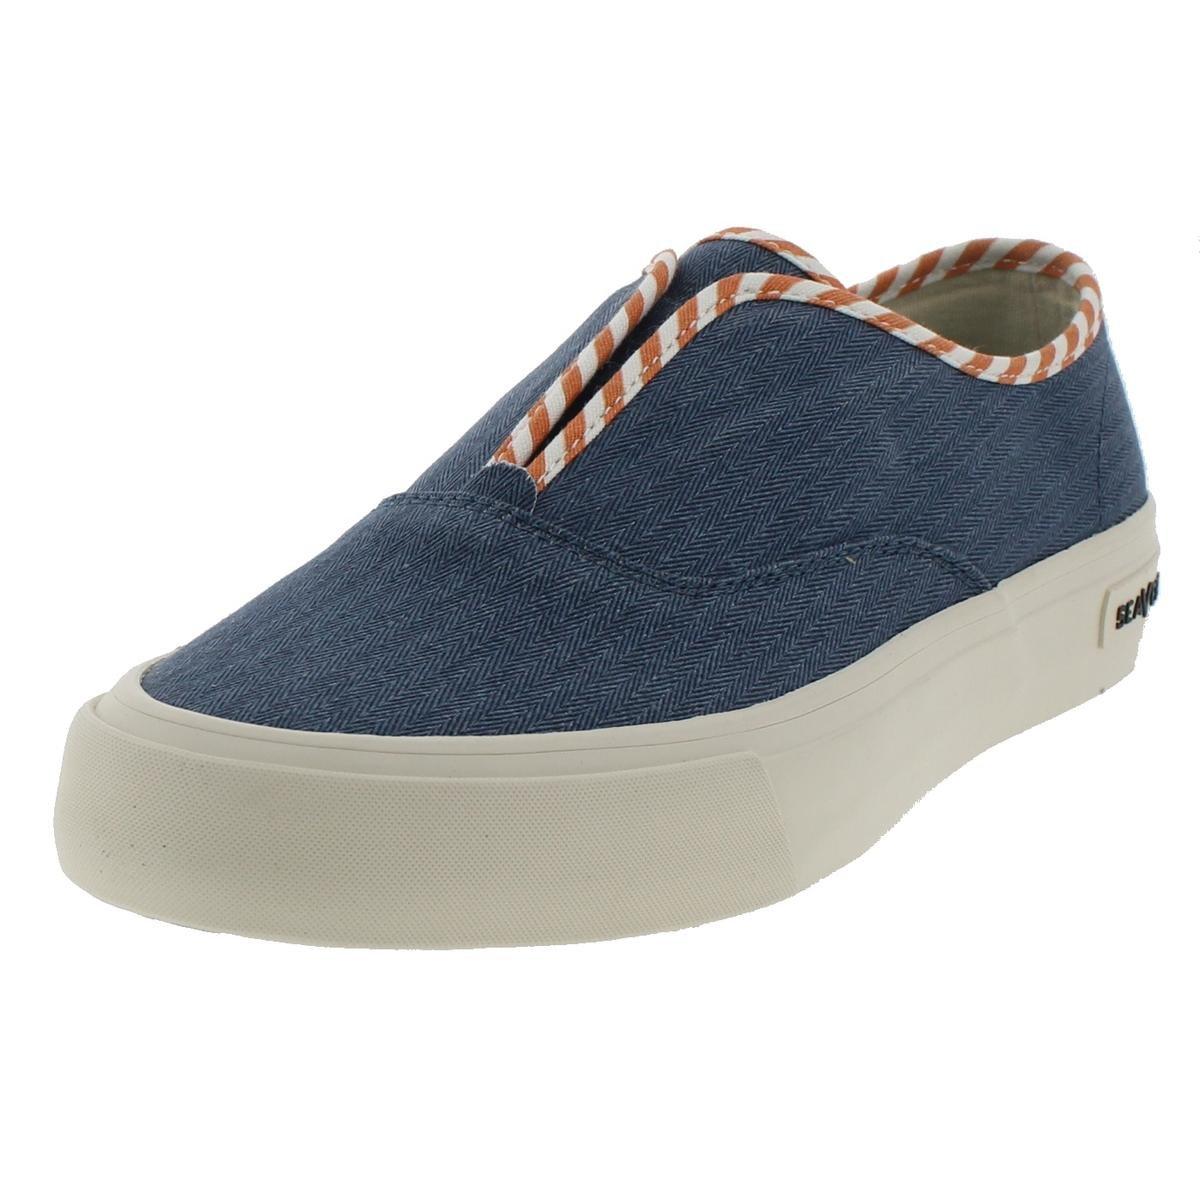 SeaVees Women's 01/64 Sunset Strip Regatta Fashion Sneaker, Riviera Blue, 9 UK/9 M US